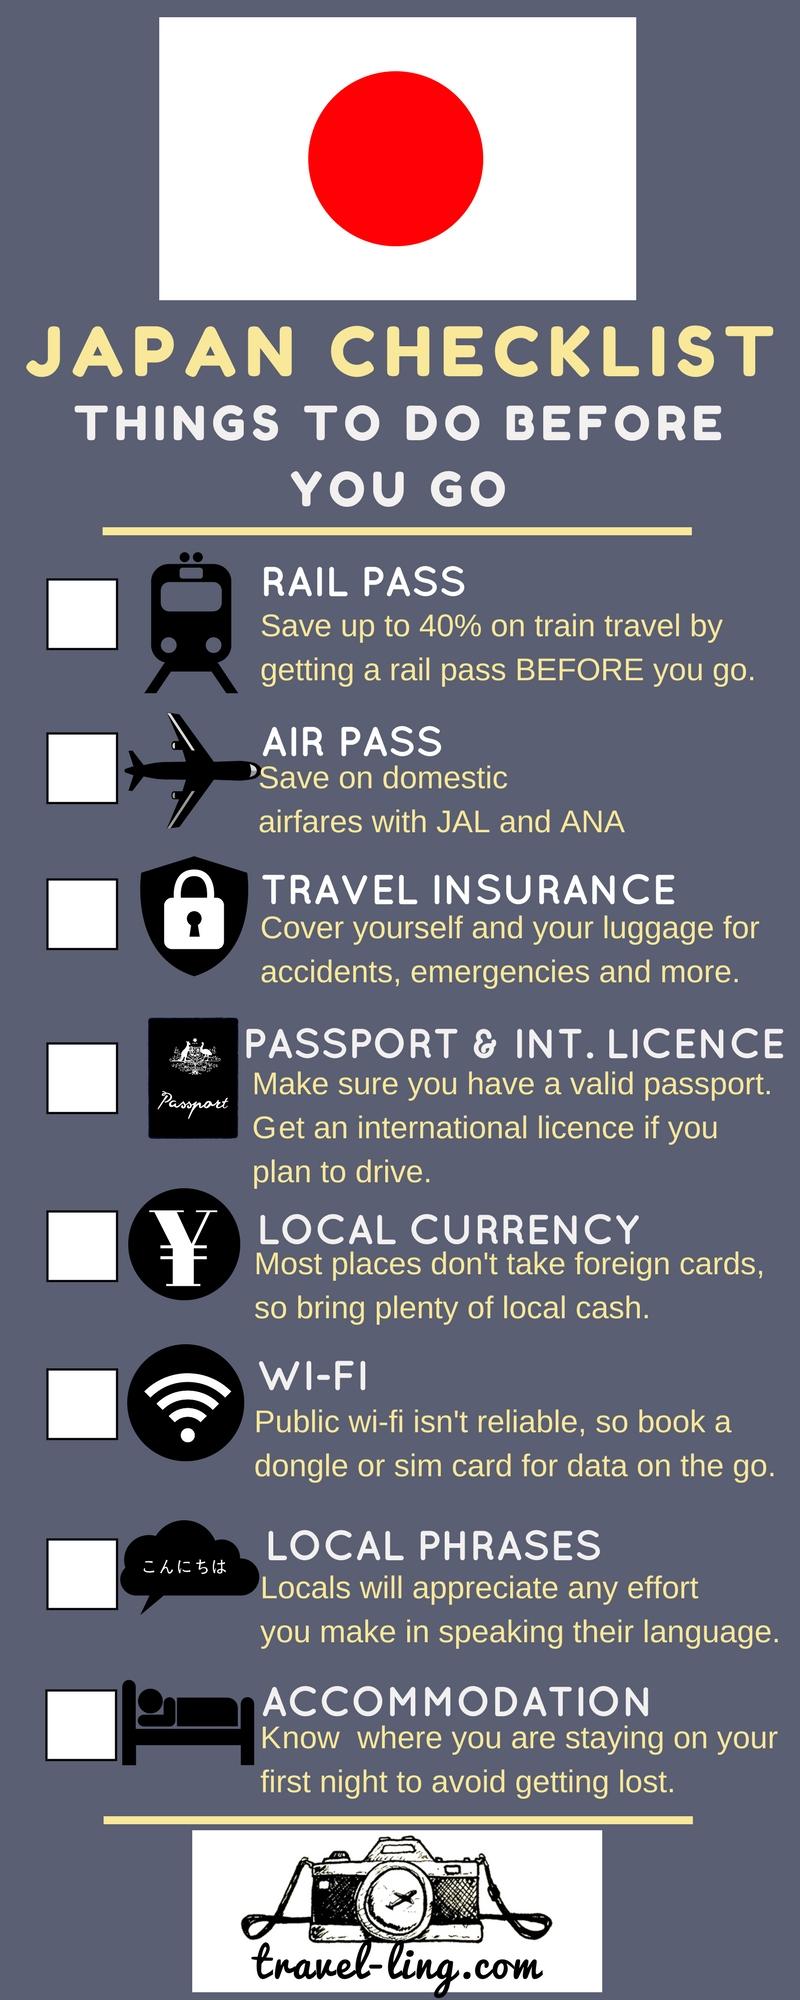 Japan Checklist